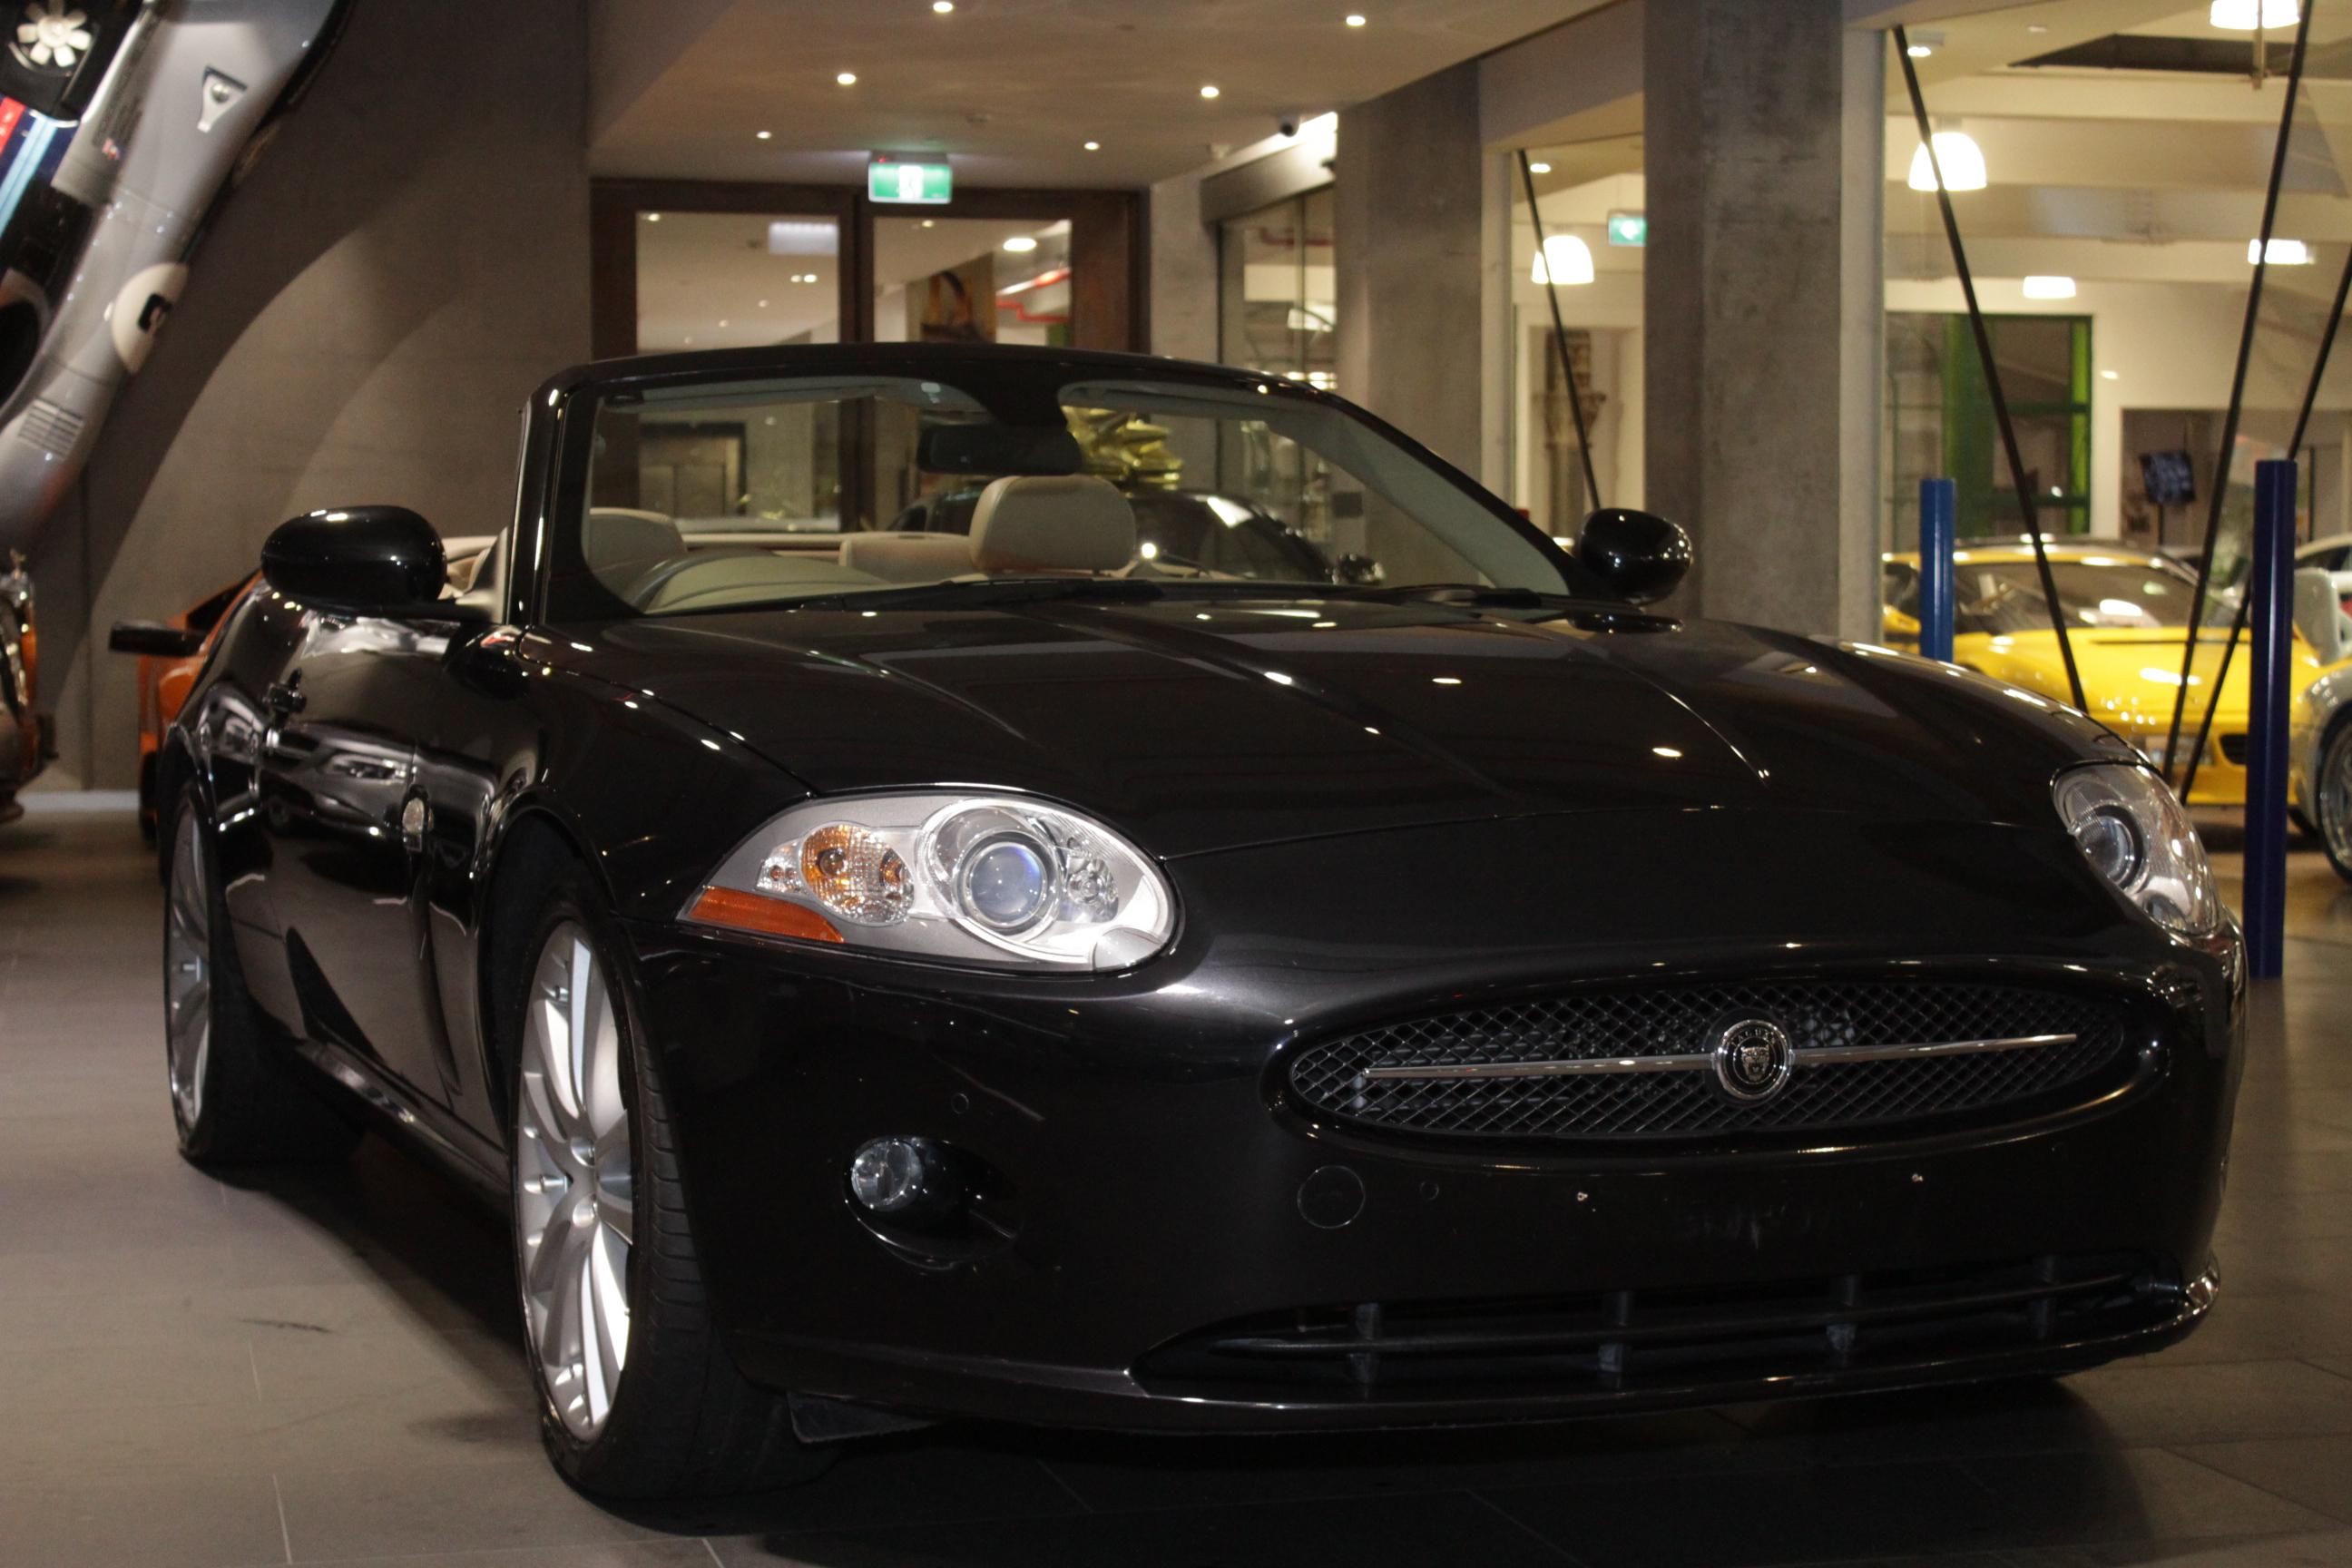 2008 Jaguar XK X150 Convertible 2dr Spts Auto 6sp 4.2i